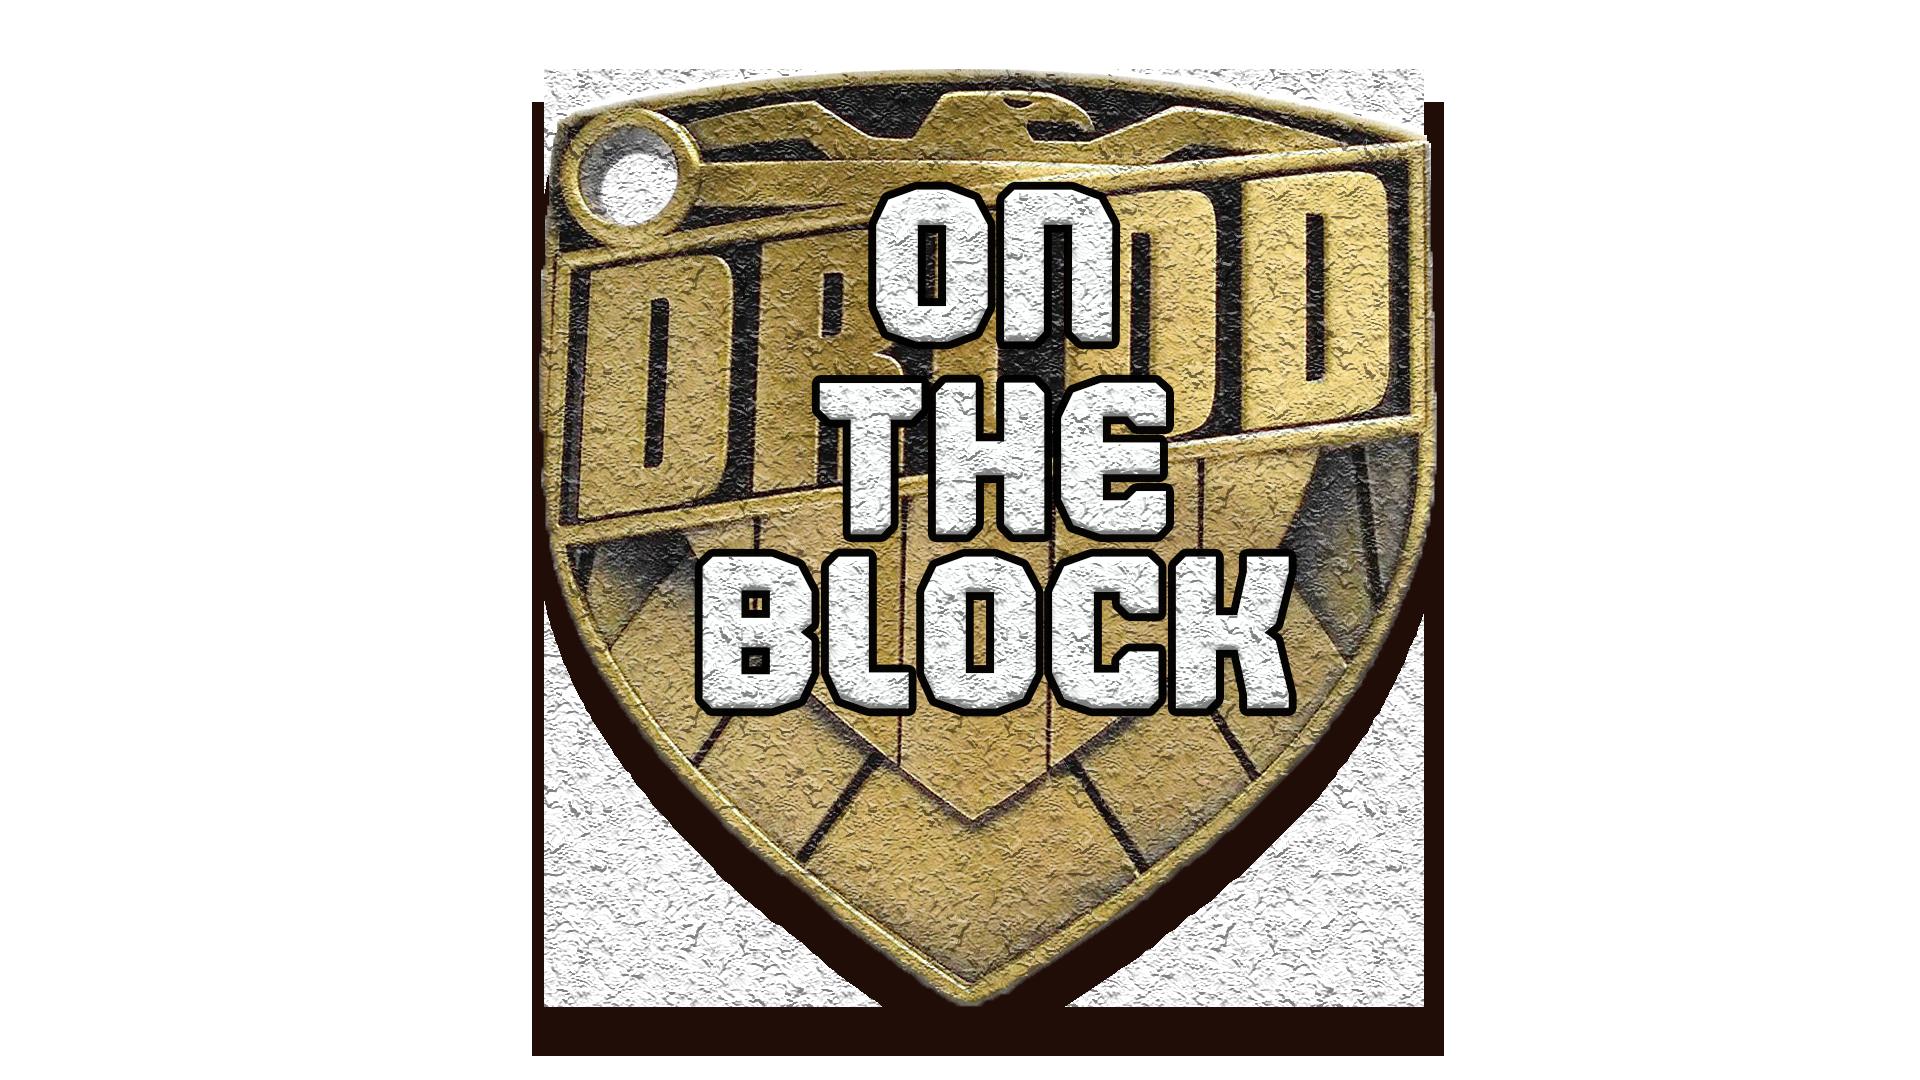 Episode 7 - Judge Dredd: On The Block show art